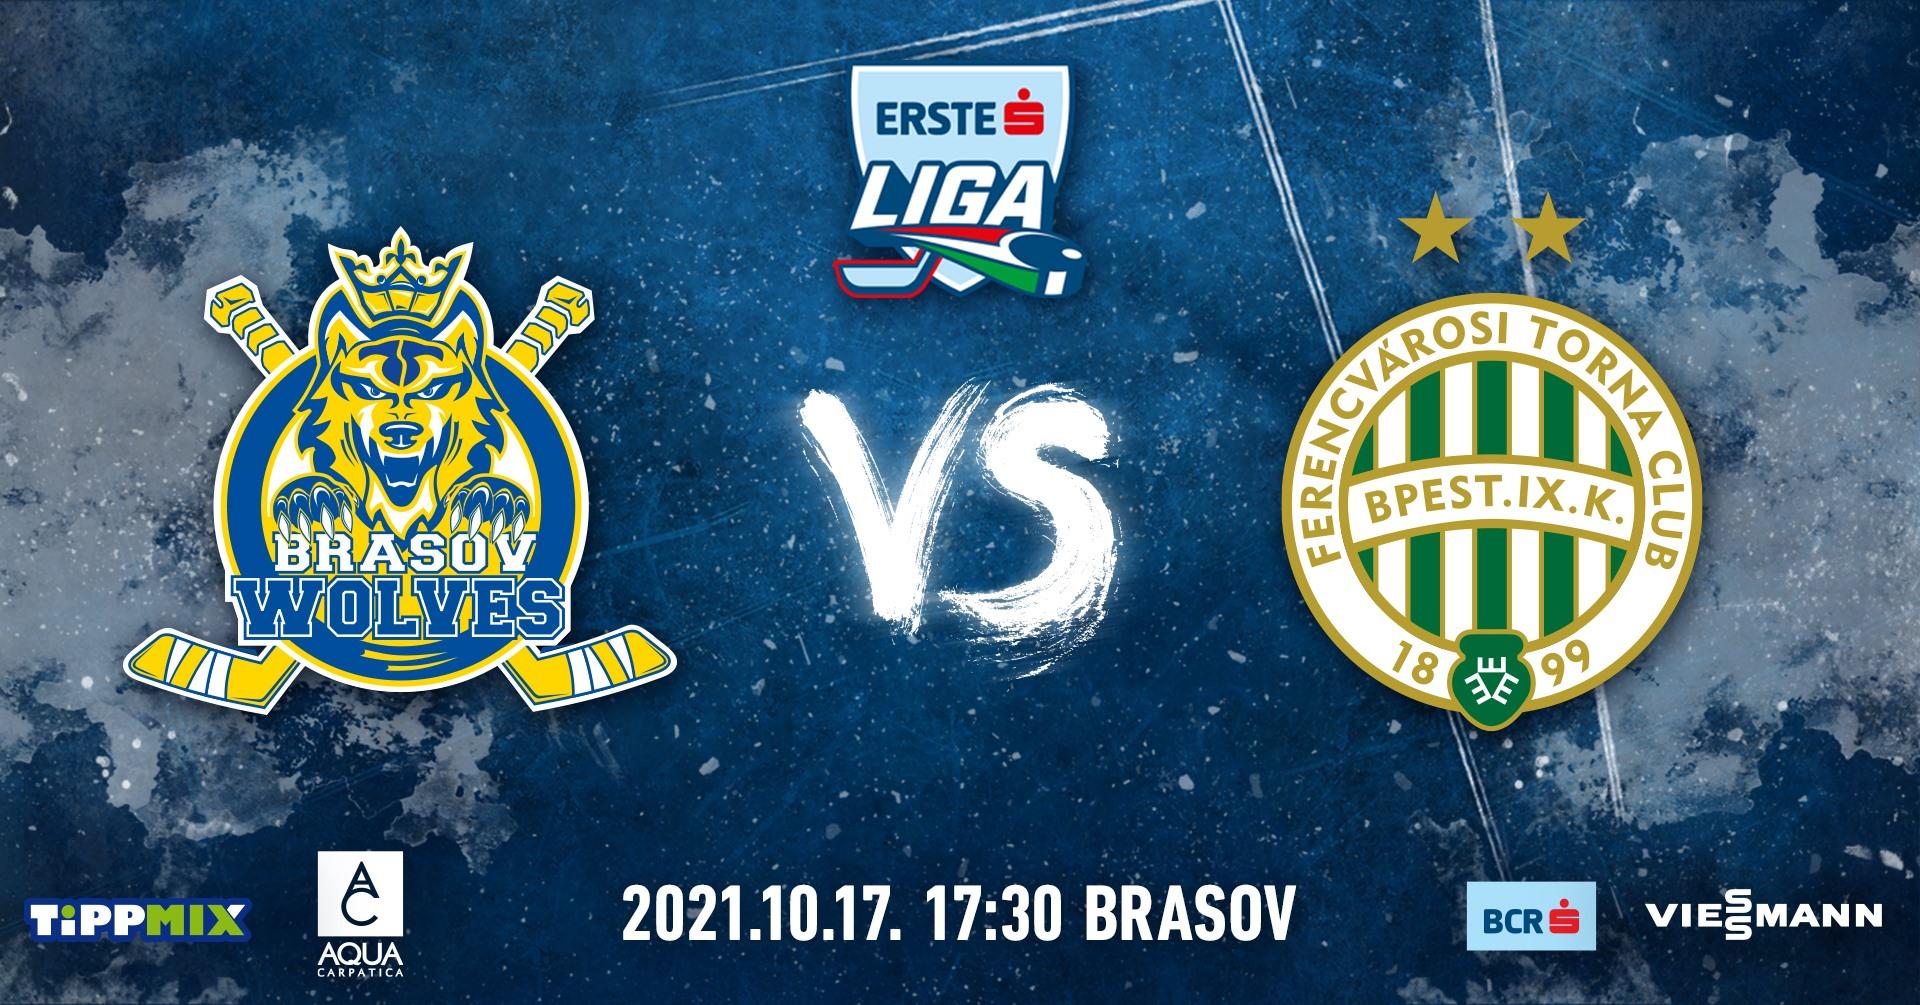 Brașov Wolves vs FTC-Telekom - EL59